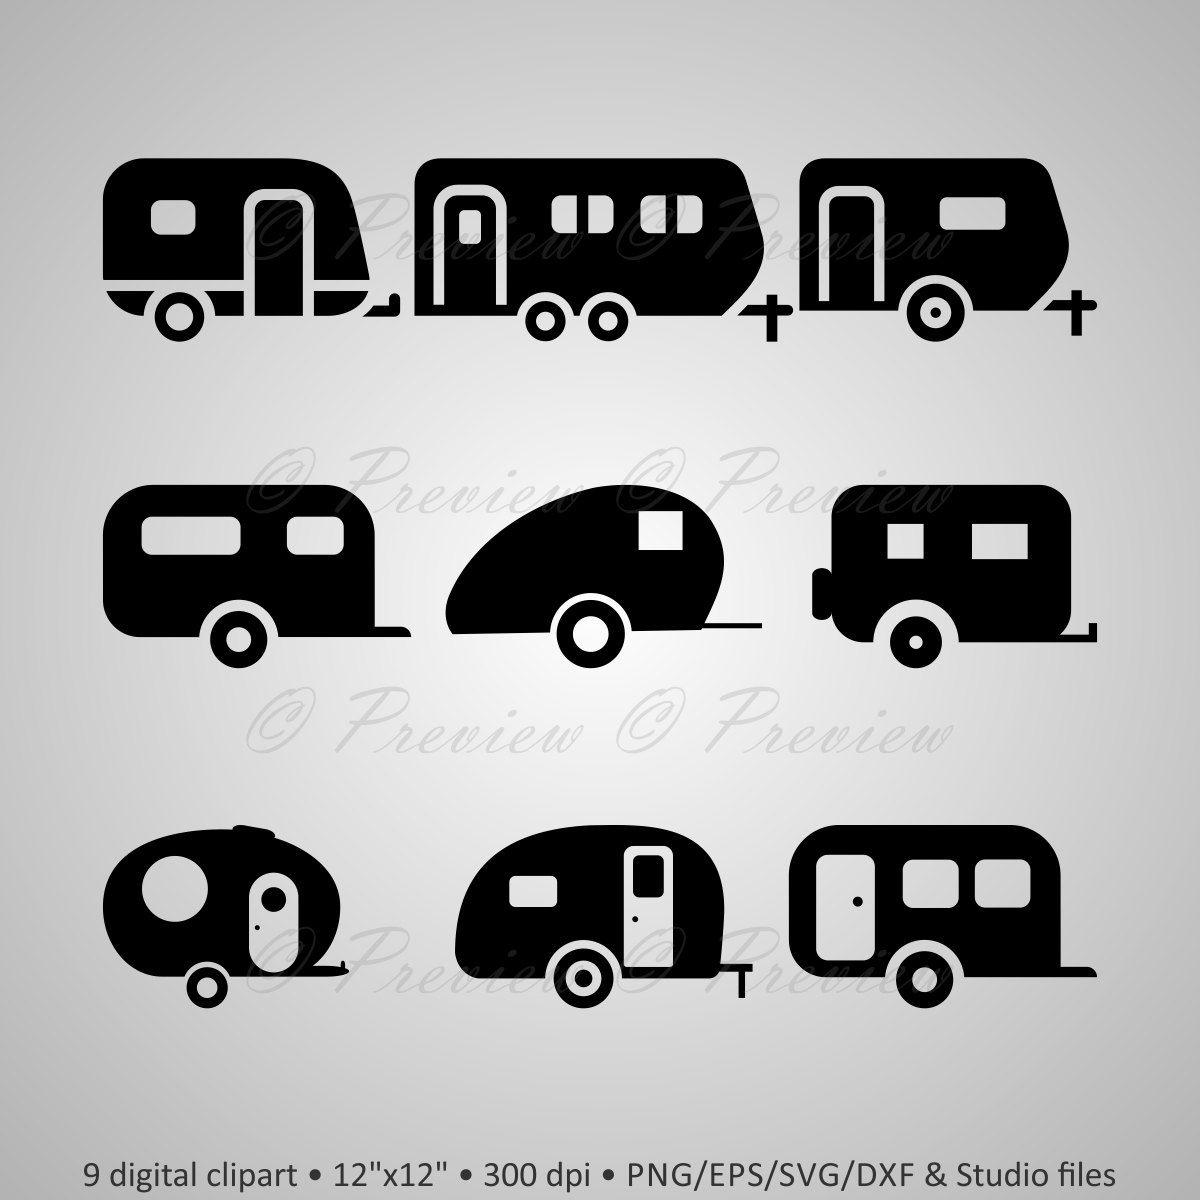 Digital Clipart Camper Silhouettes Summer Travel Trailer Caravan Vinyl Decal Black Images Png Eps Svg Dxf Studio Files